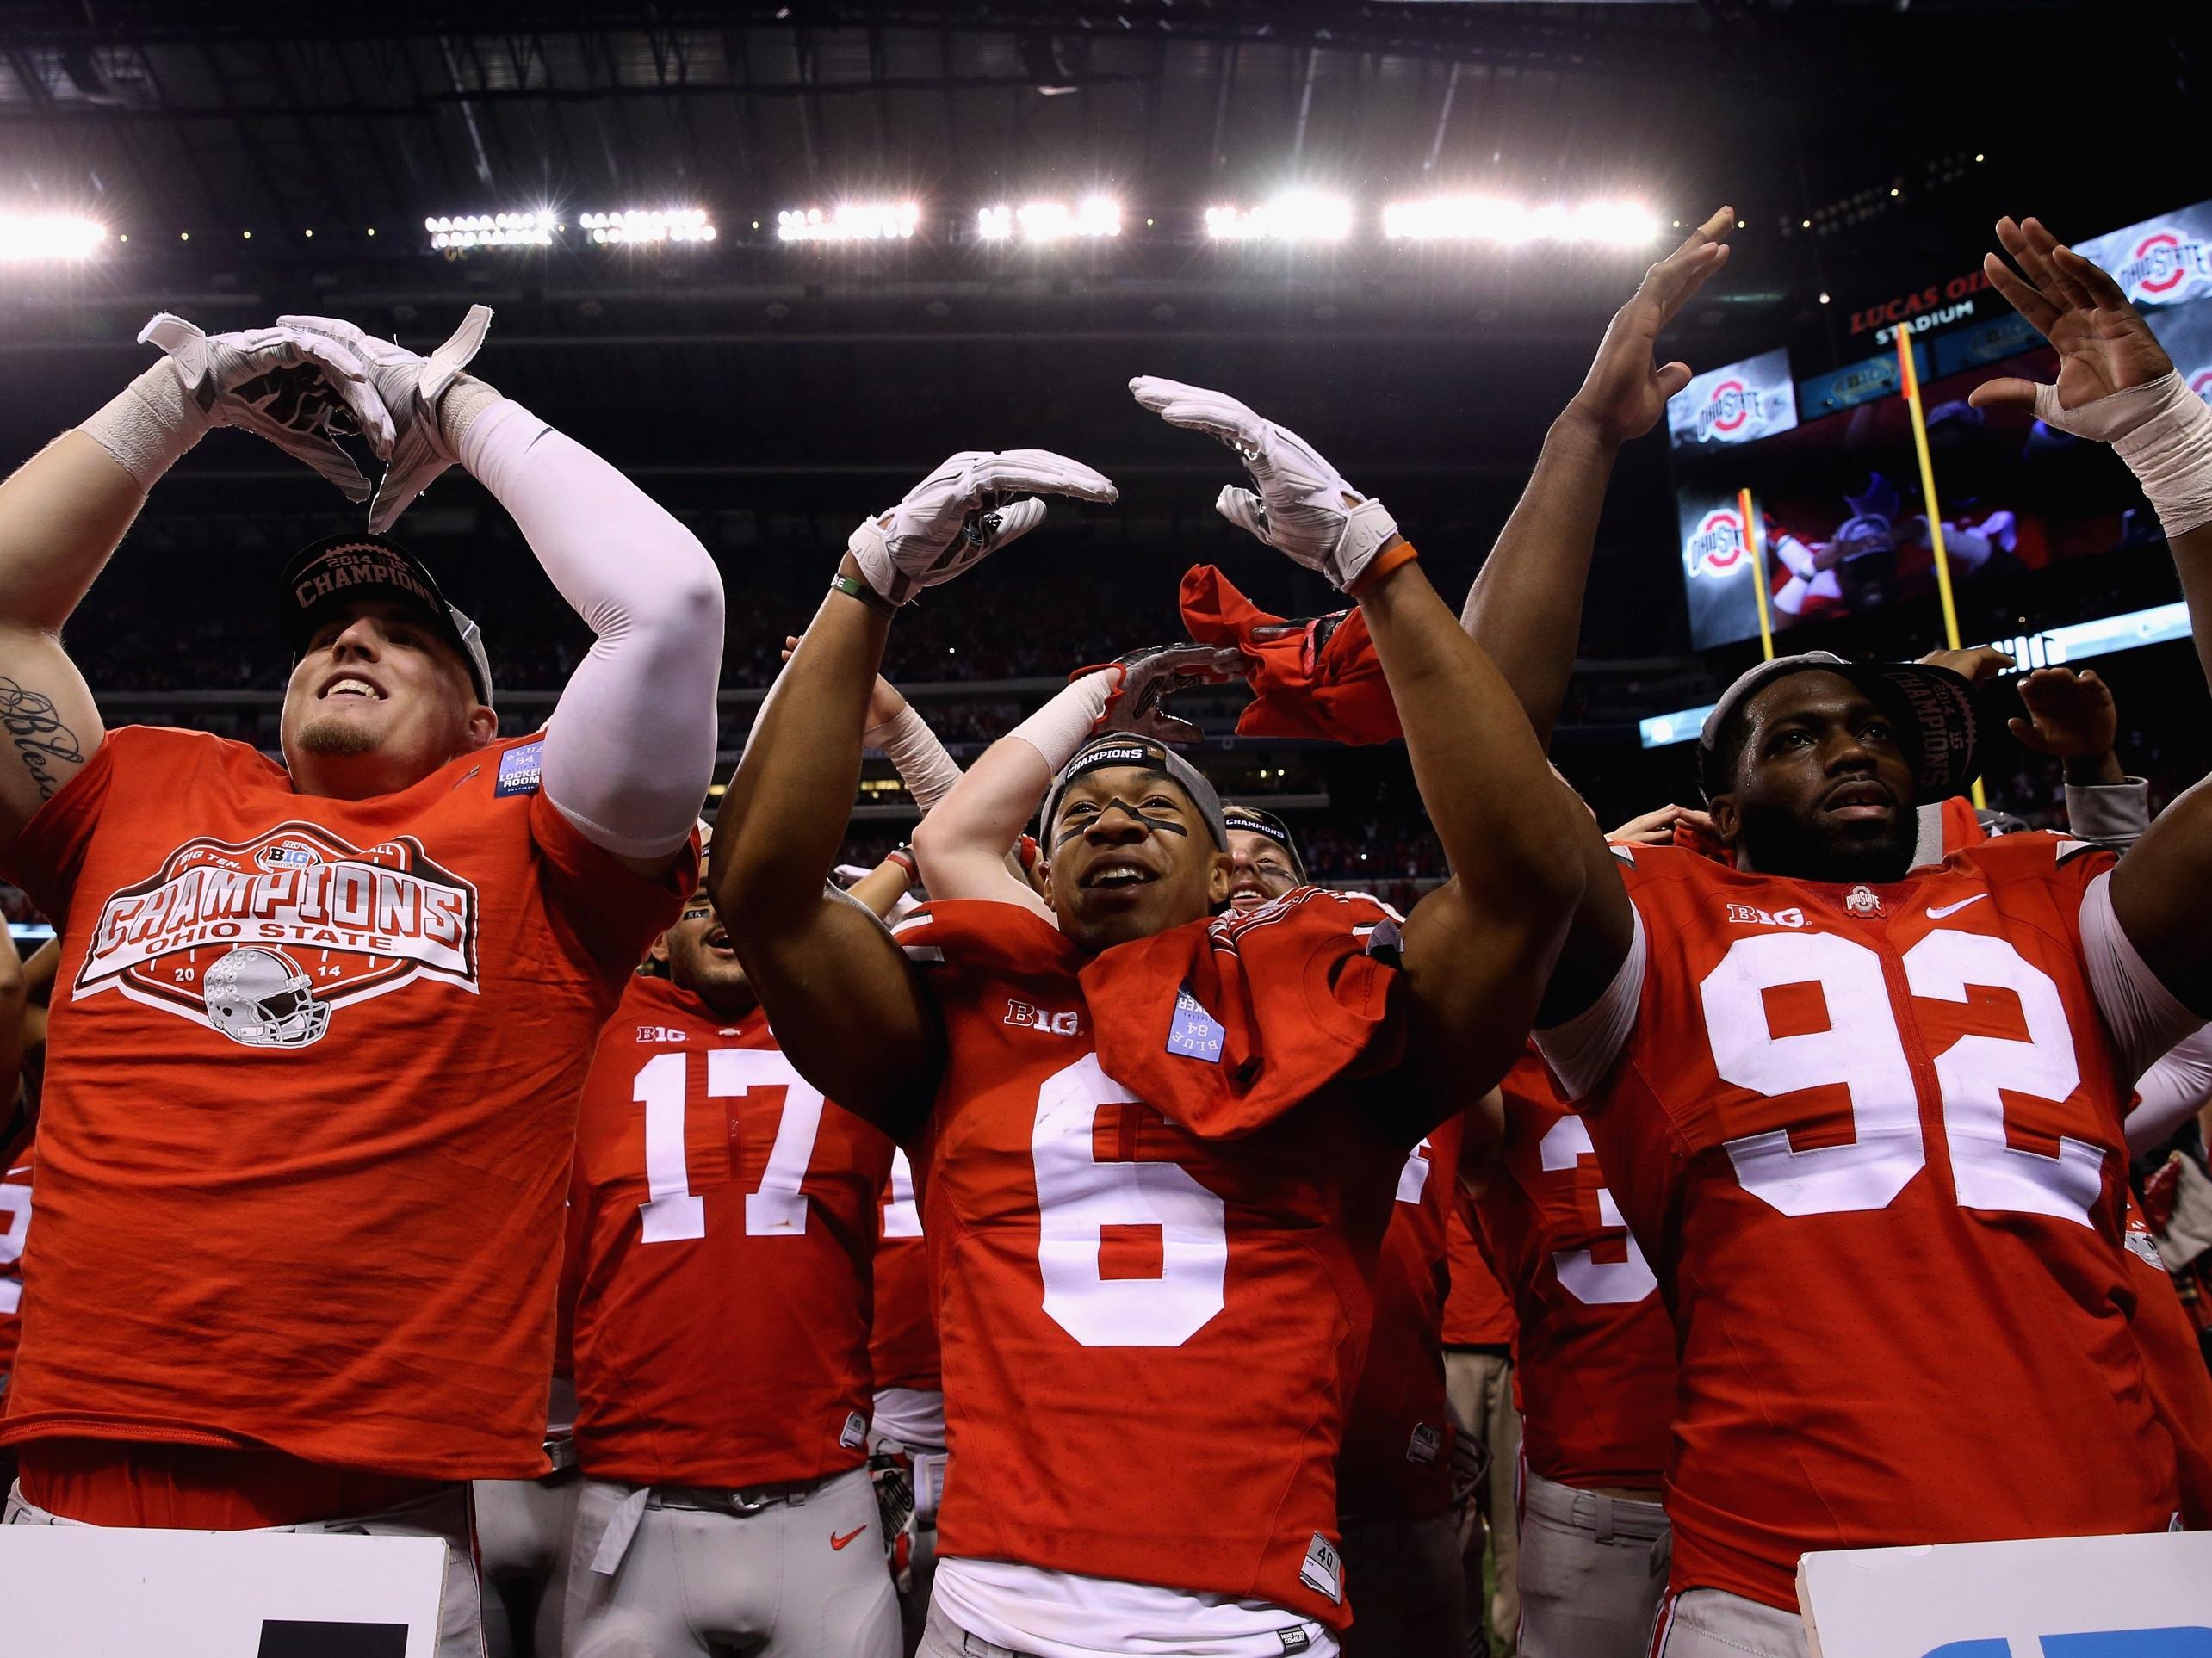 Big Ten Championship – Ohio State v Wisconsin